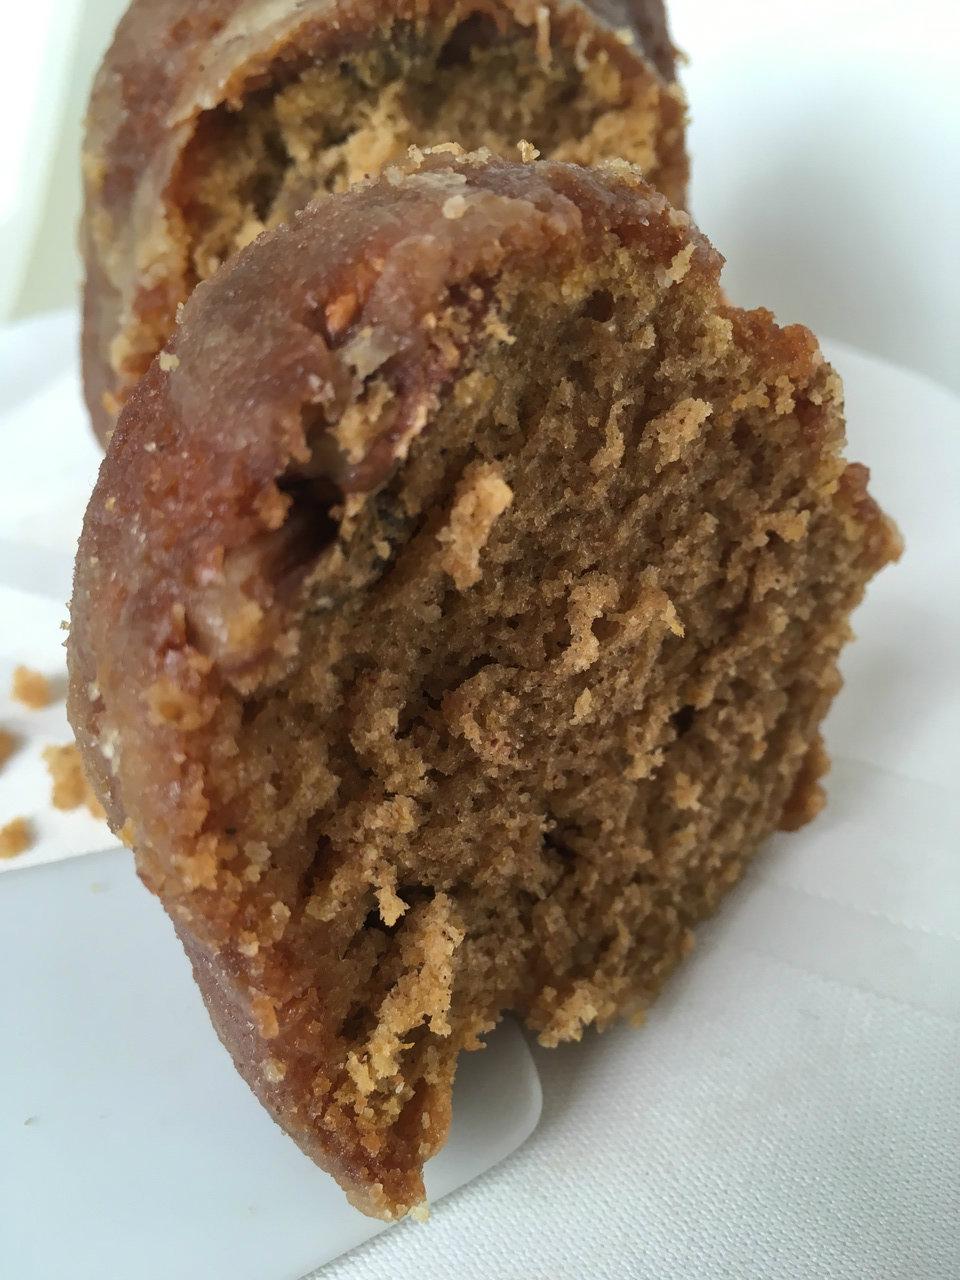 Rock'n Pumpkin RumChata! Rum Cake